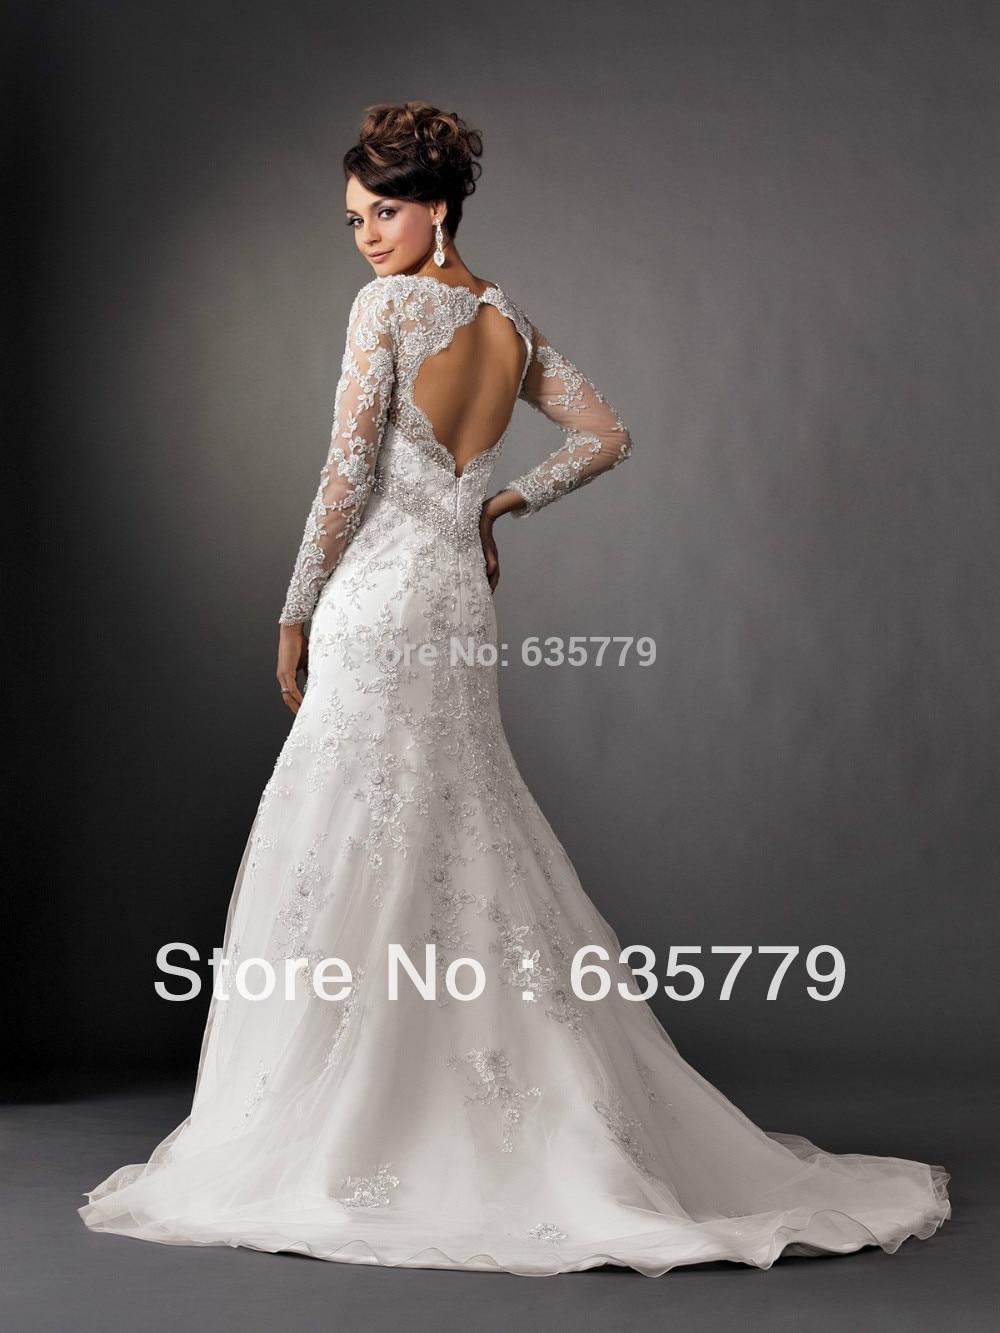 silver lace wedding dress silver wedding dresses Silver Lace Wedding Dresses Reviewweddingdresses Net